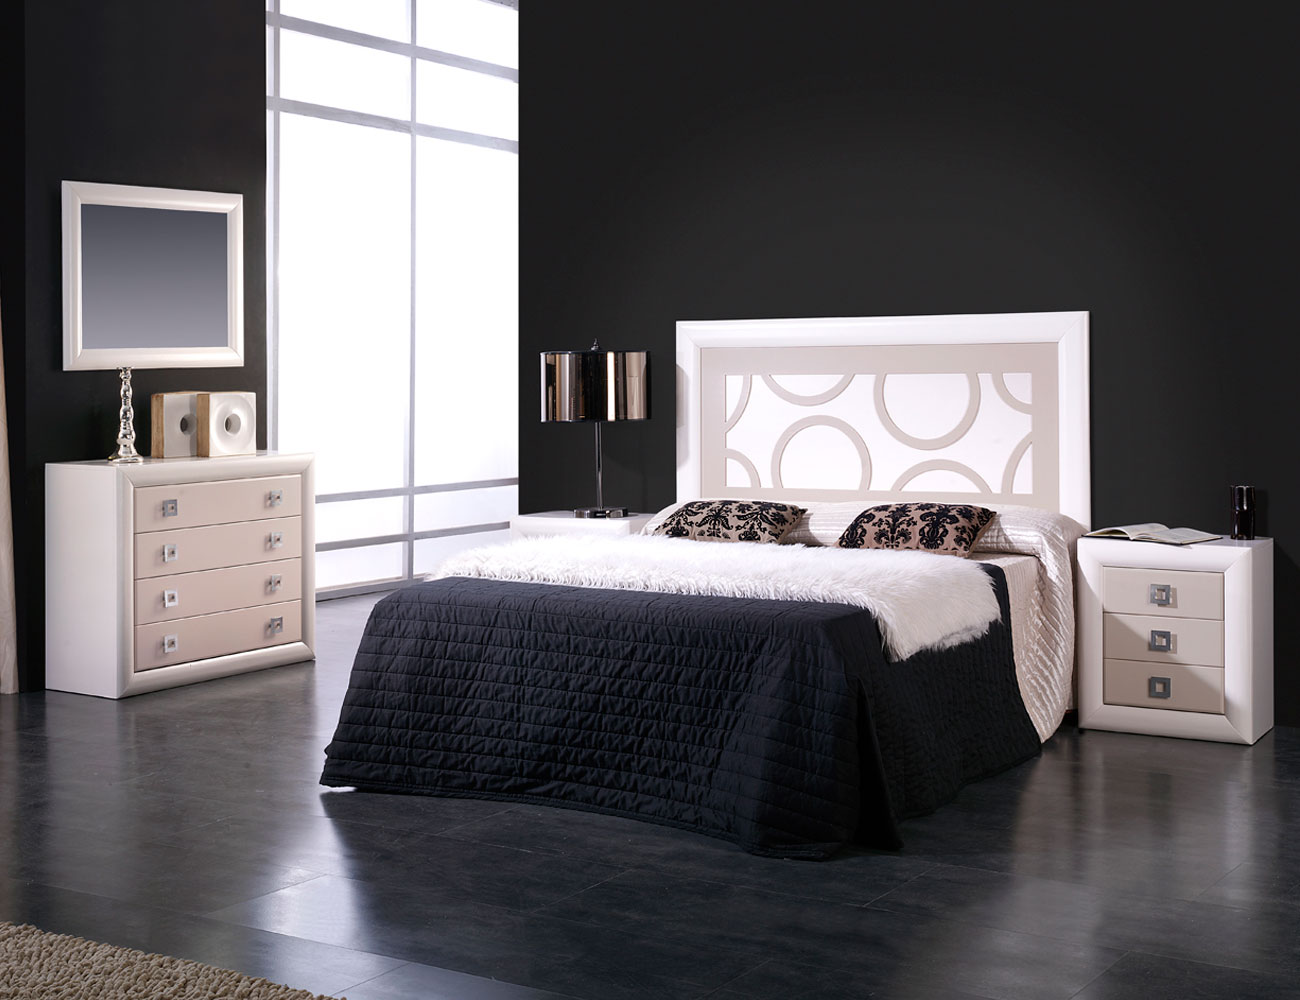 Dormitorio matrimonio lacado blanco roto piedra2